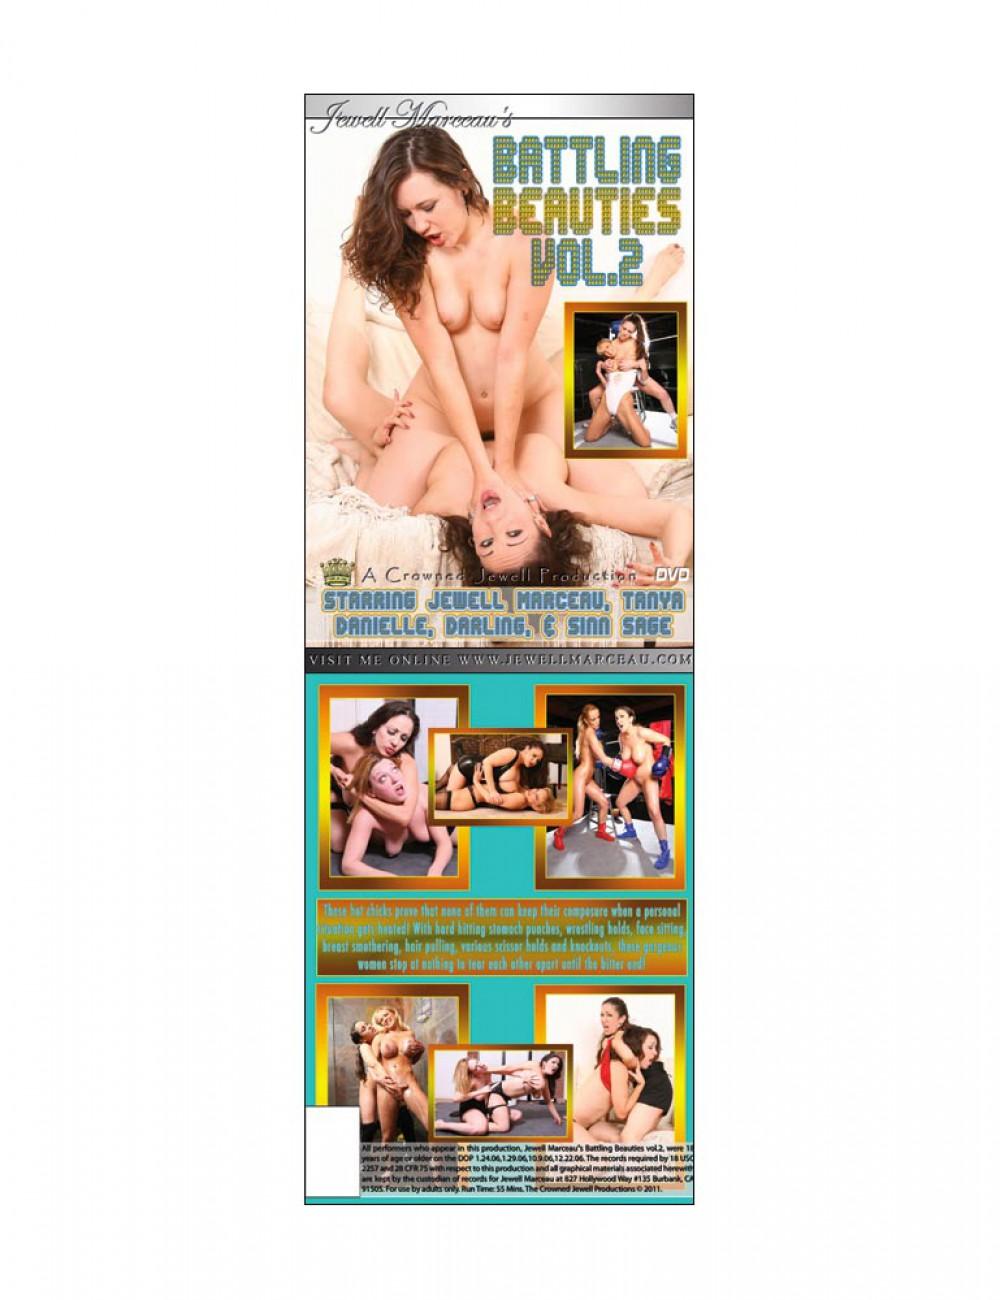 Battling Beauties Vol. 2 DVD